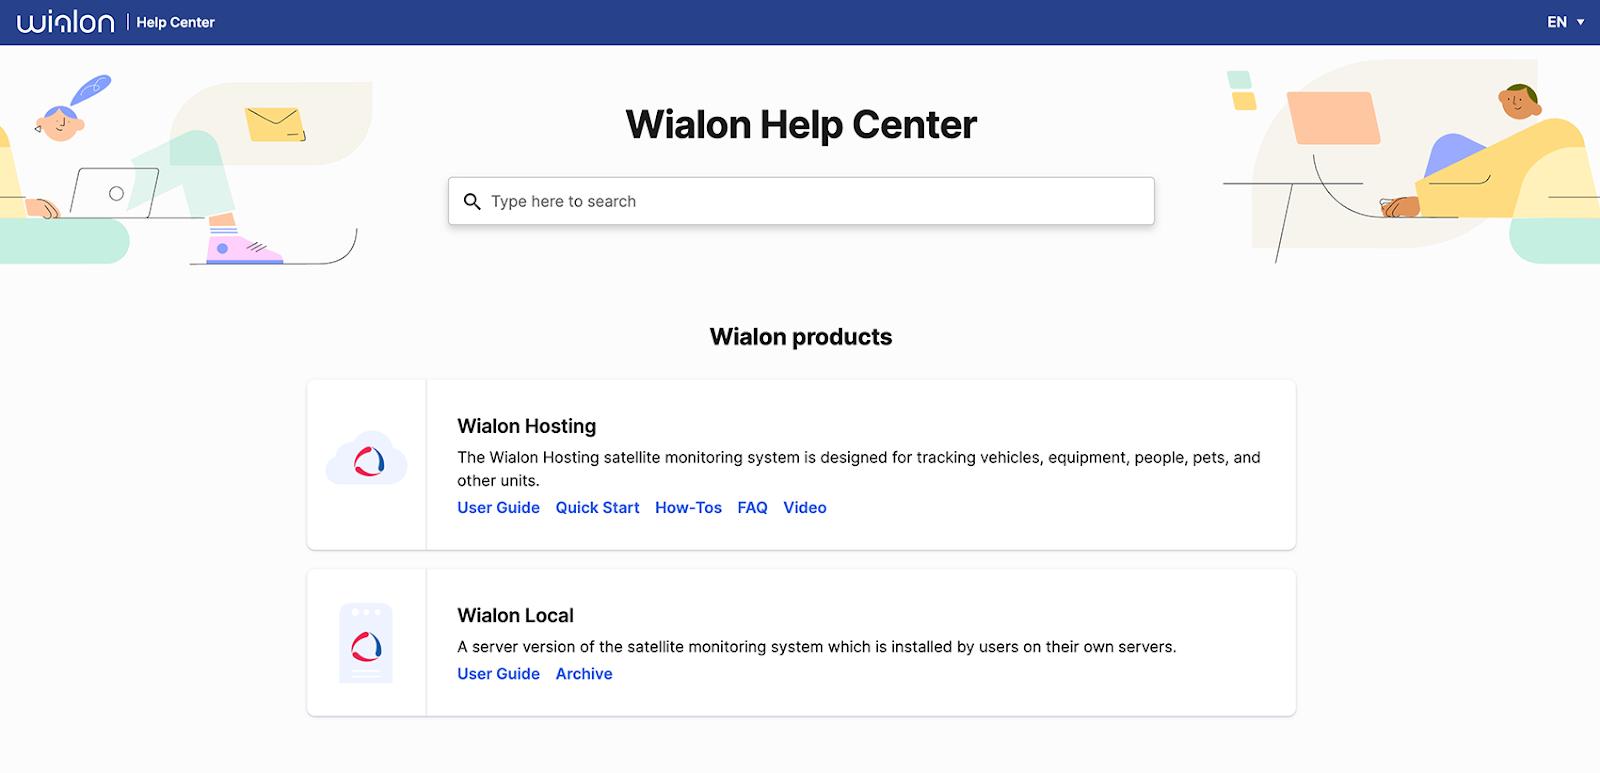 Wialon help center